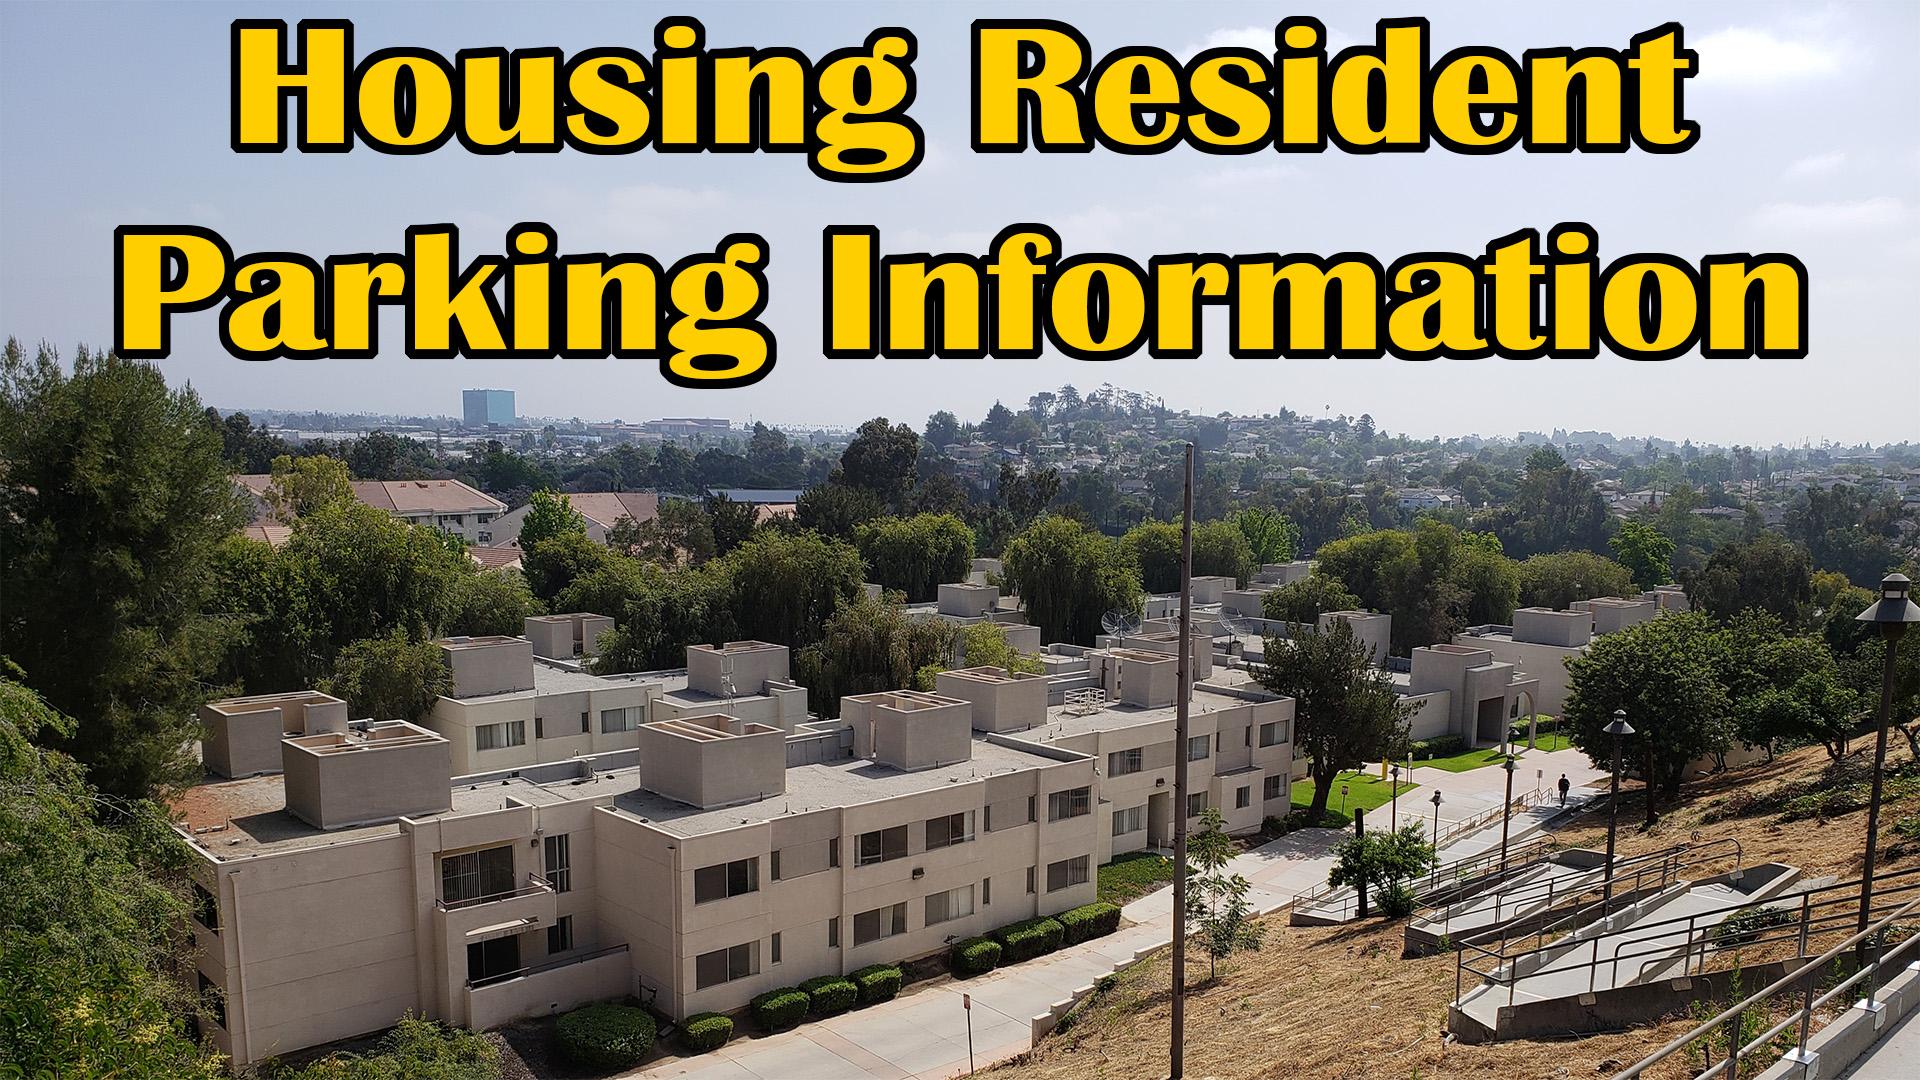 Housing Resident Parking Information